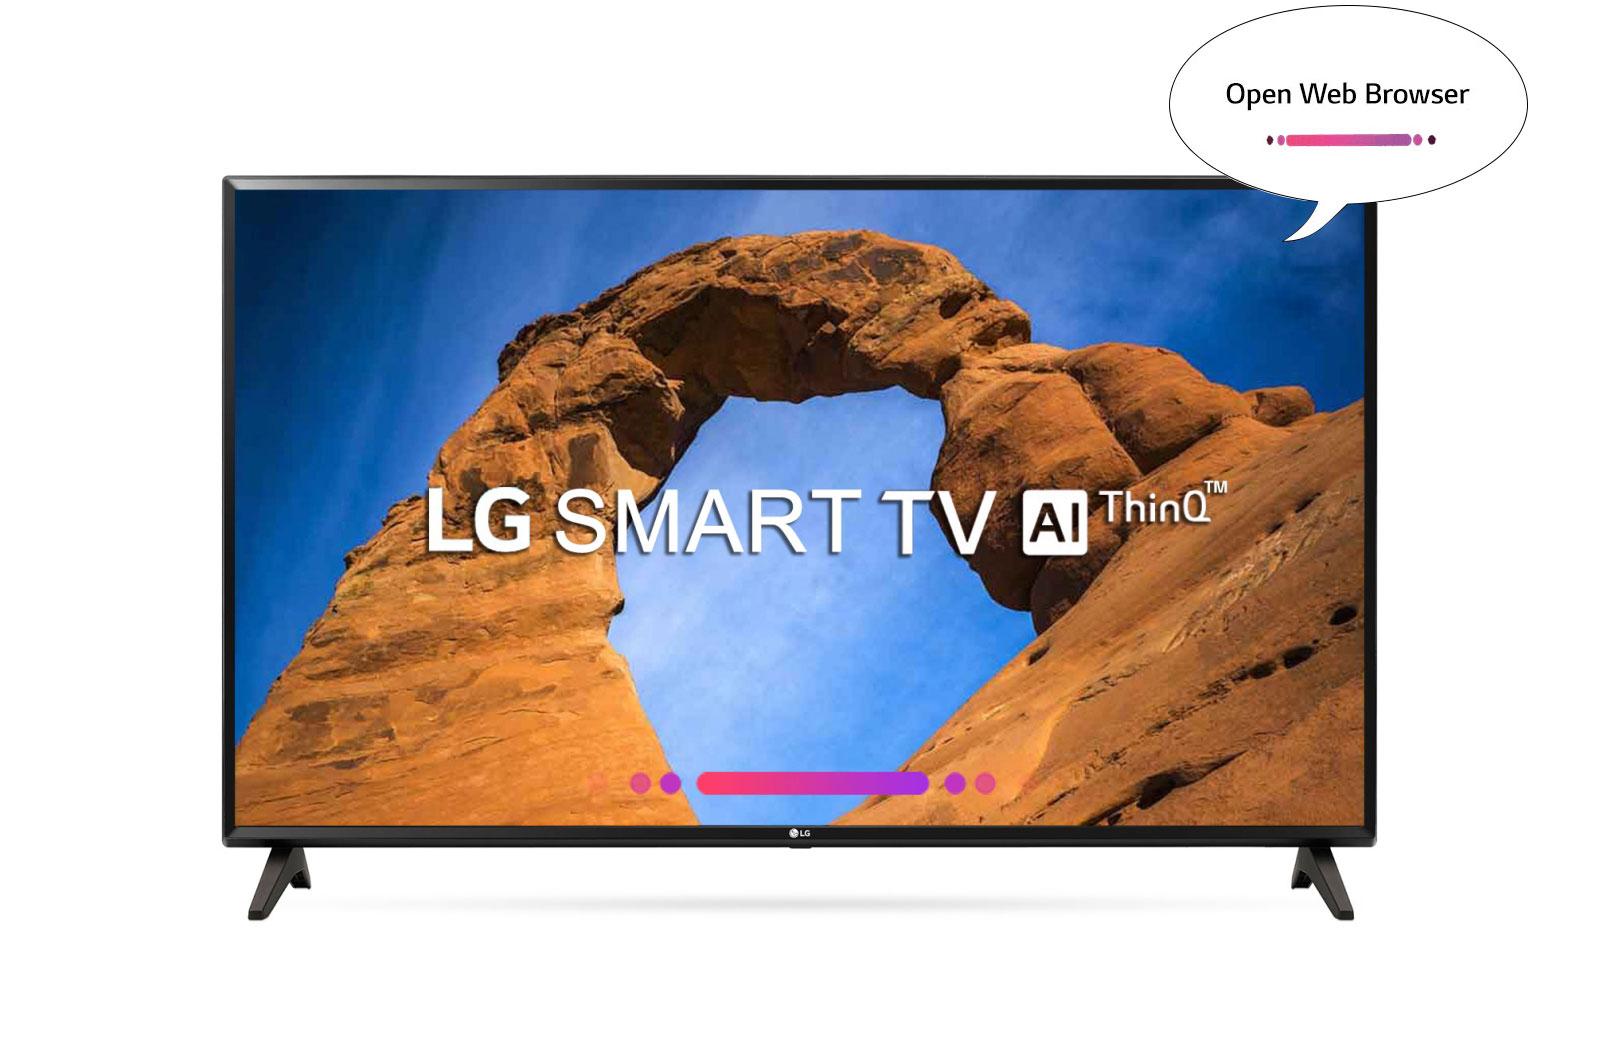 LG thin1 tv AI